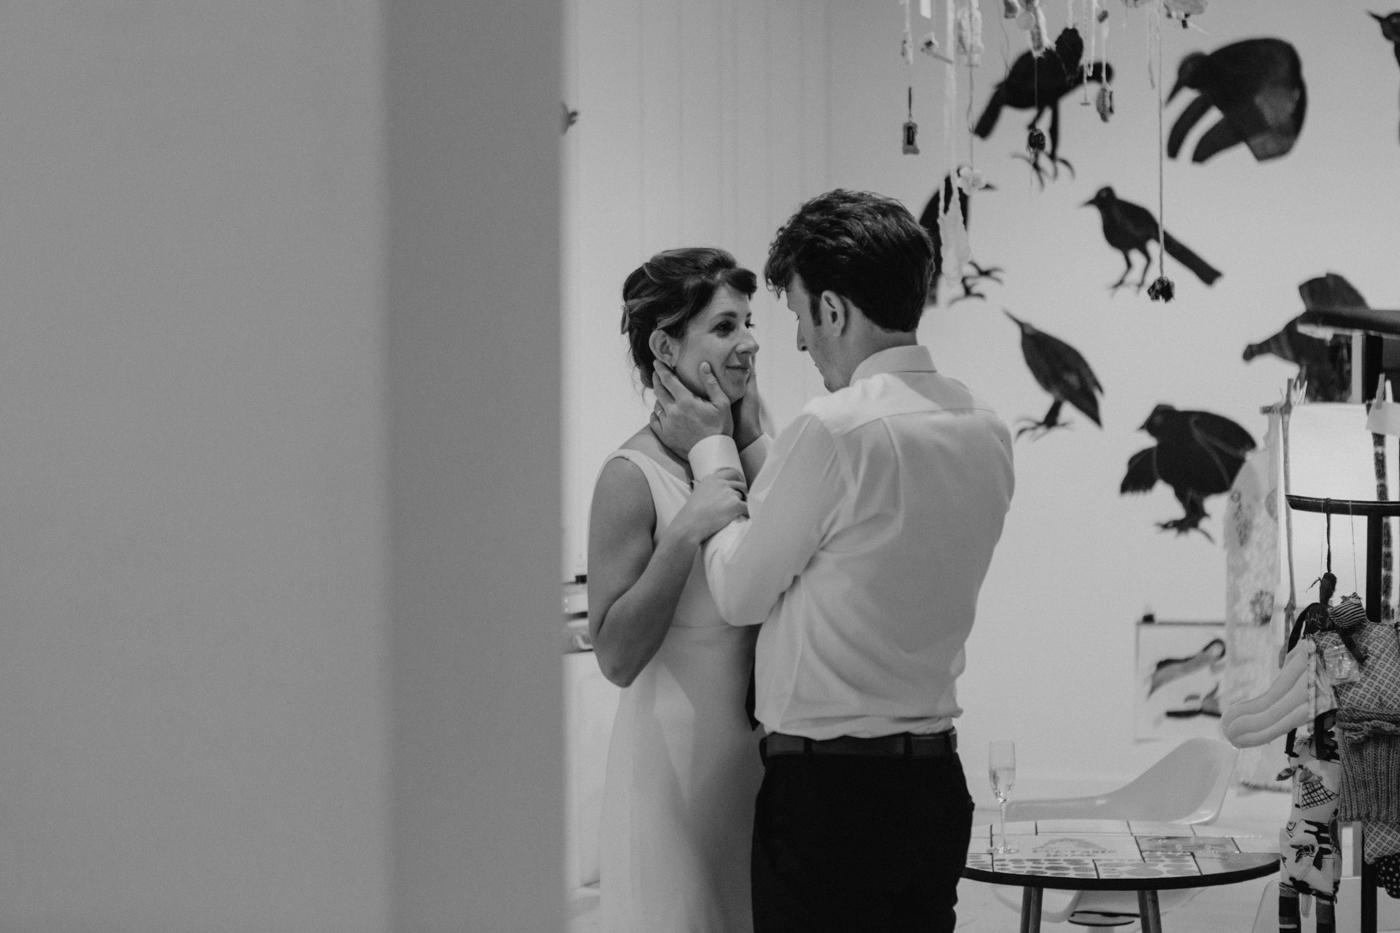 boulder-museum-modern-art-colorado-wedding-138.jpg